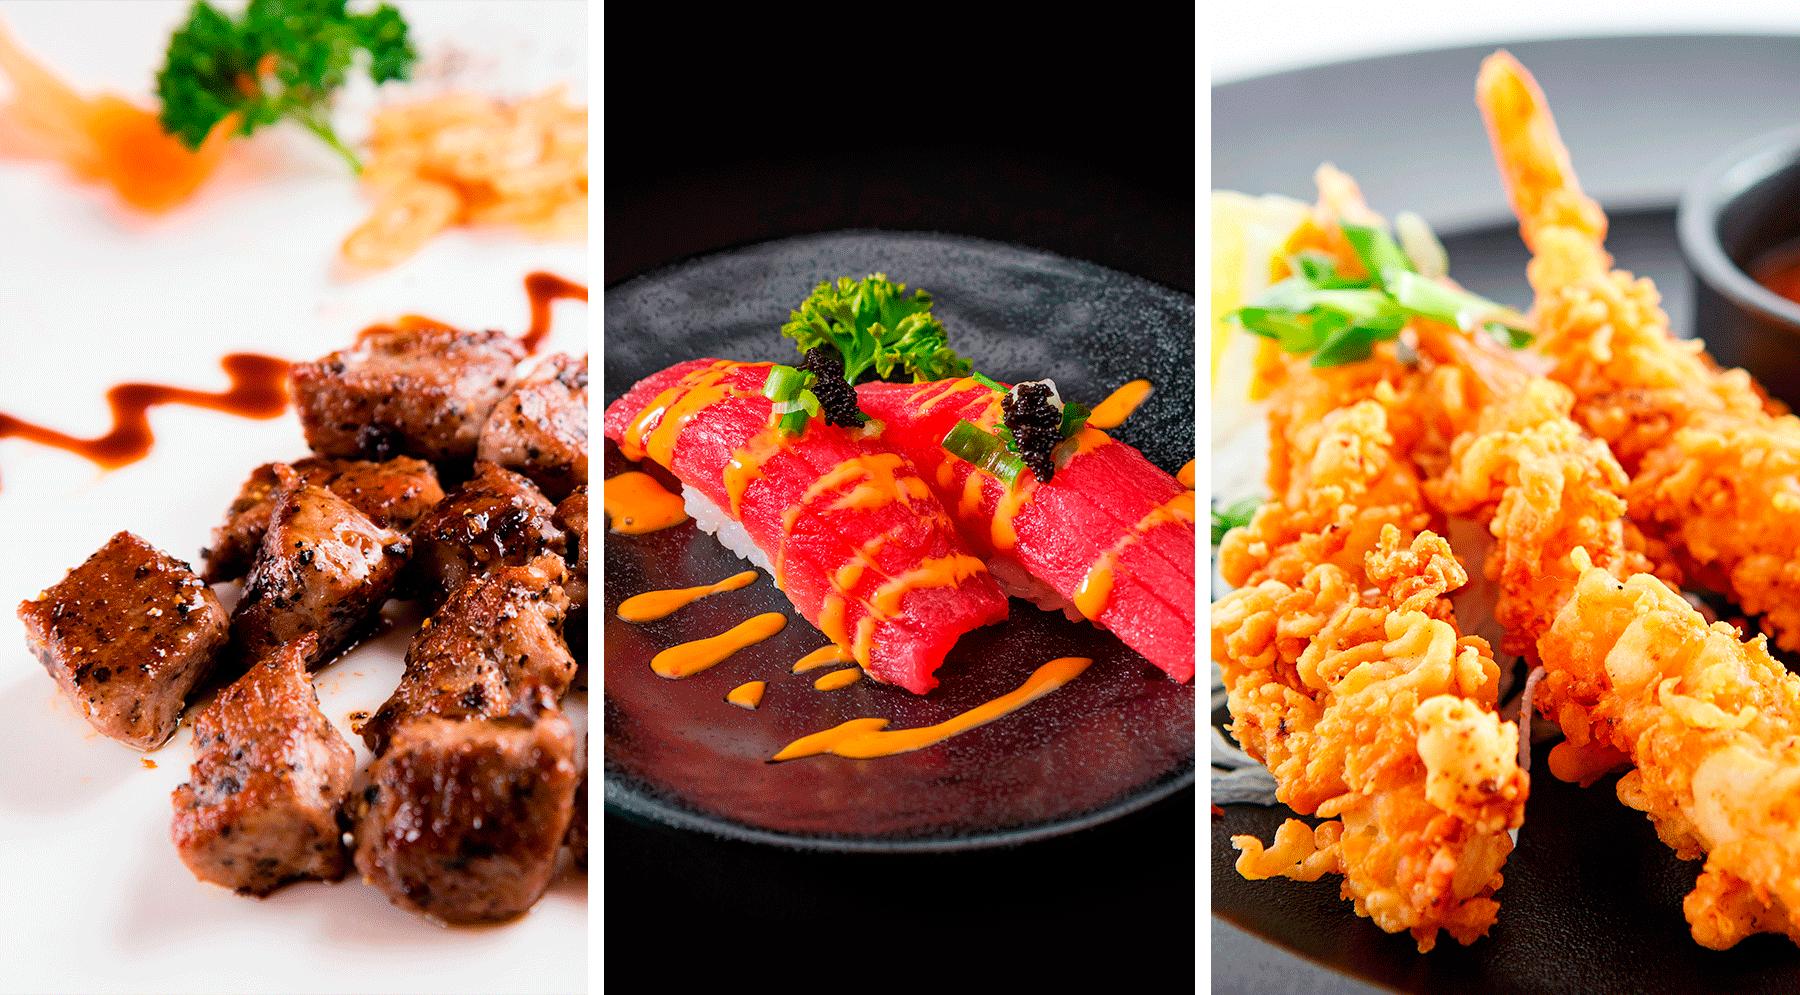 Smaakvolle gerechten & bewonder menu